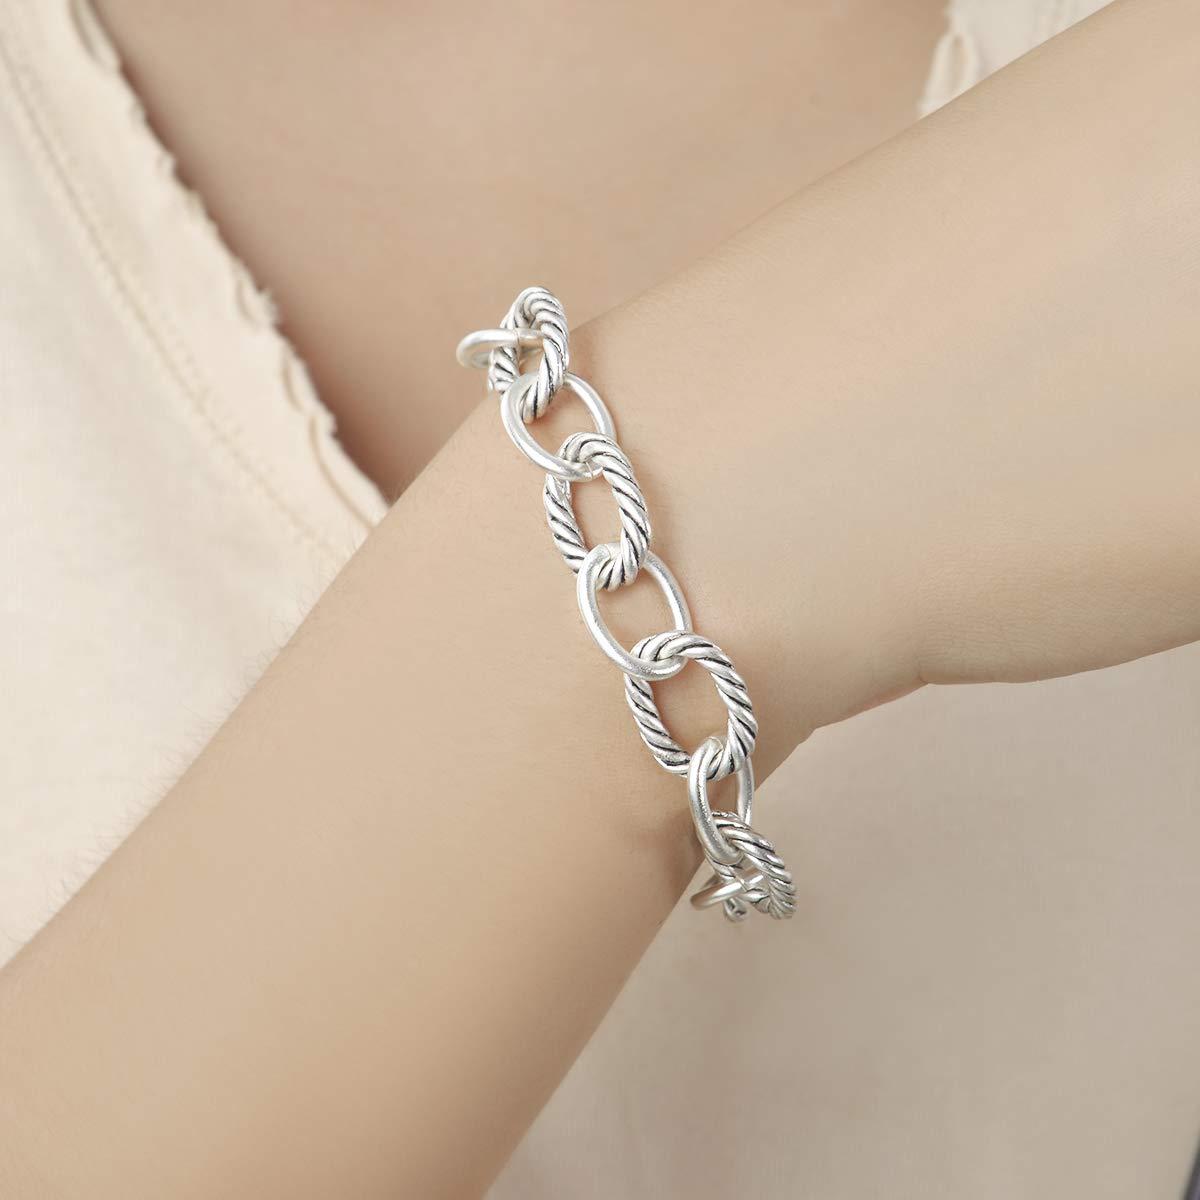 UNY Bracelet Designer Brand Inspired Antique Women Jewelry Cable Wire Vintage Valentine